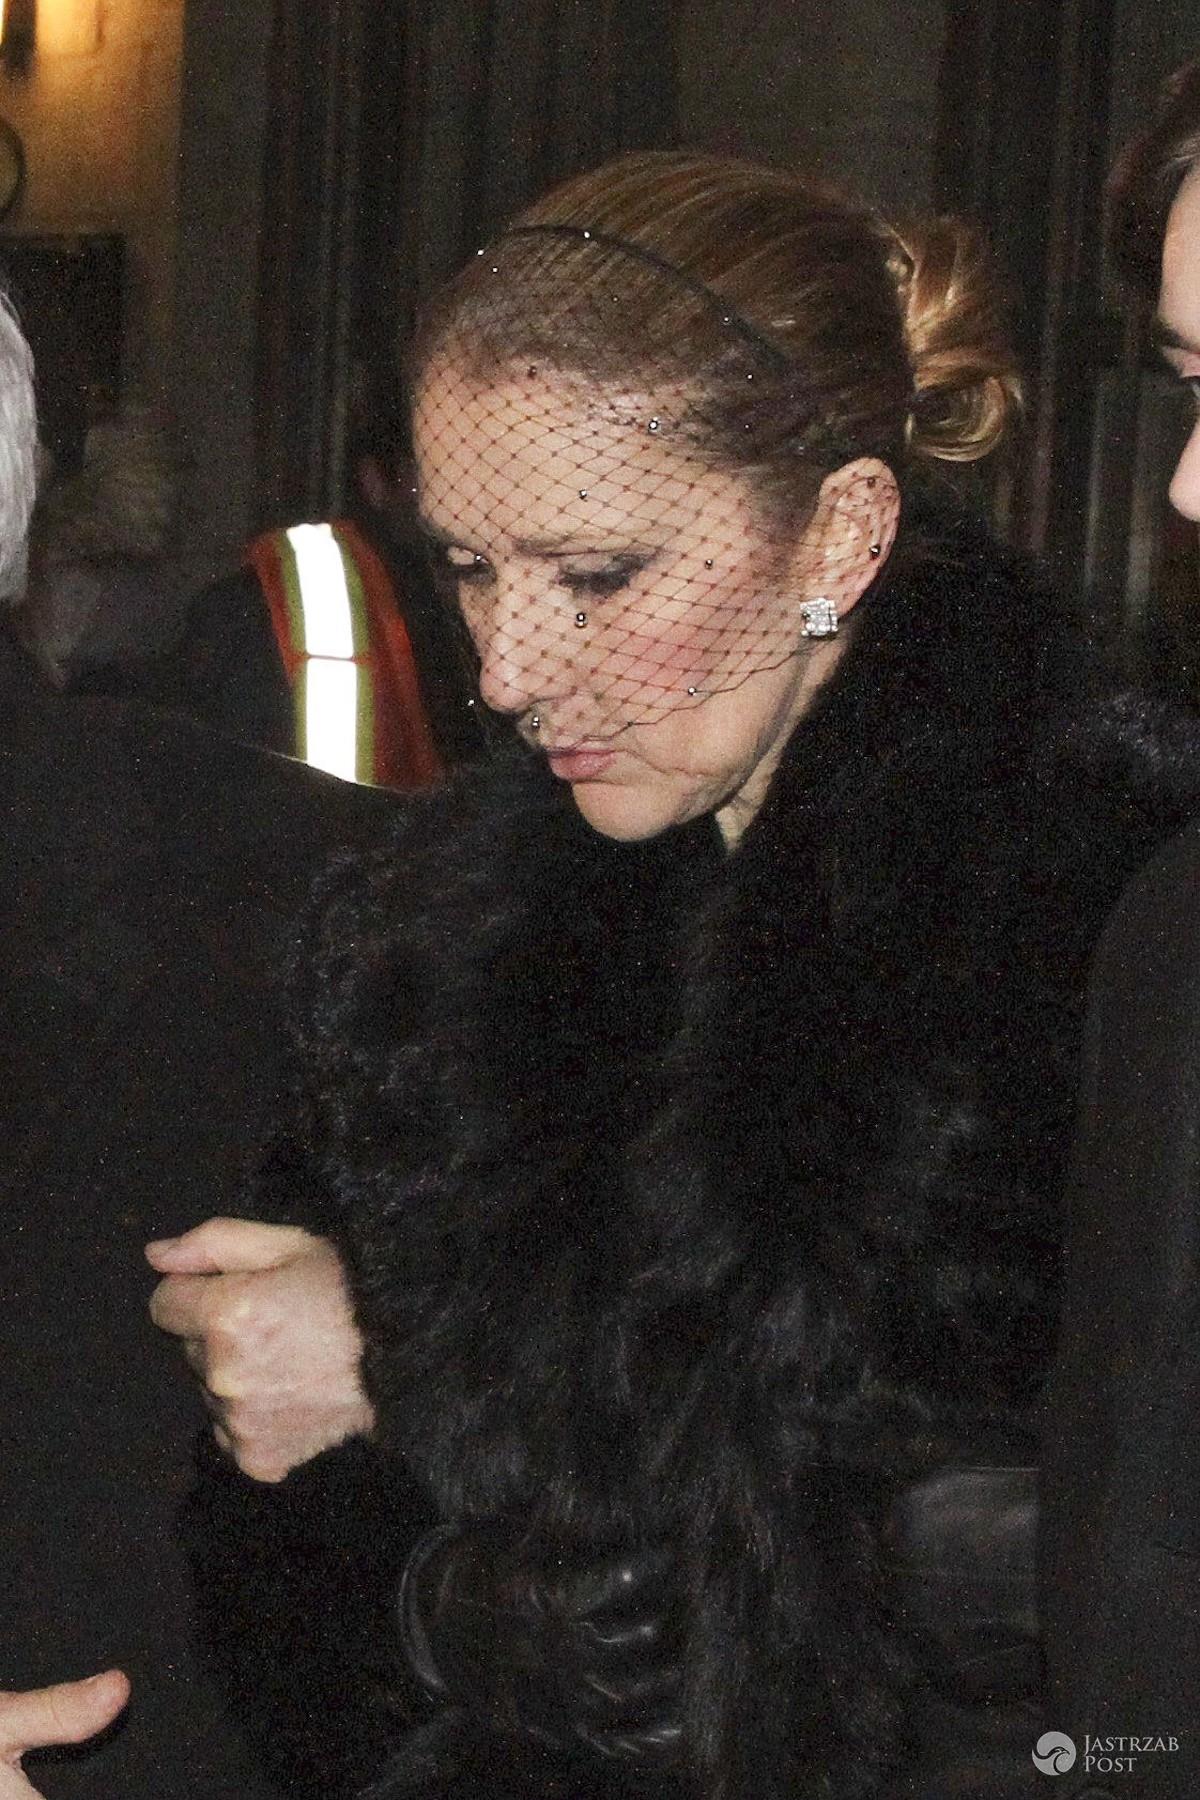 Pogrzeb Rene Angelil, męża Celine Dion fot. East News